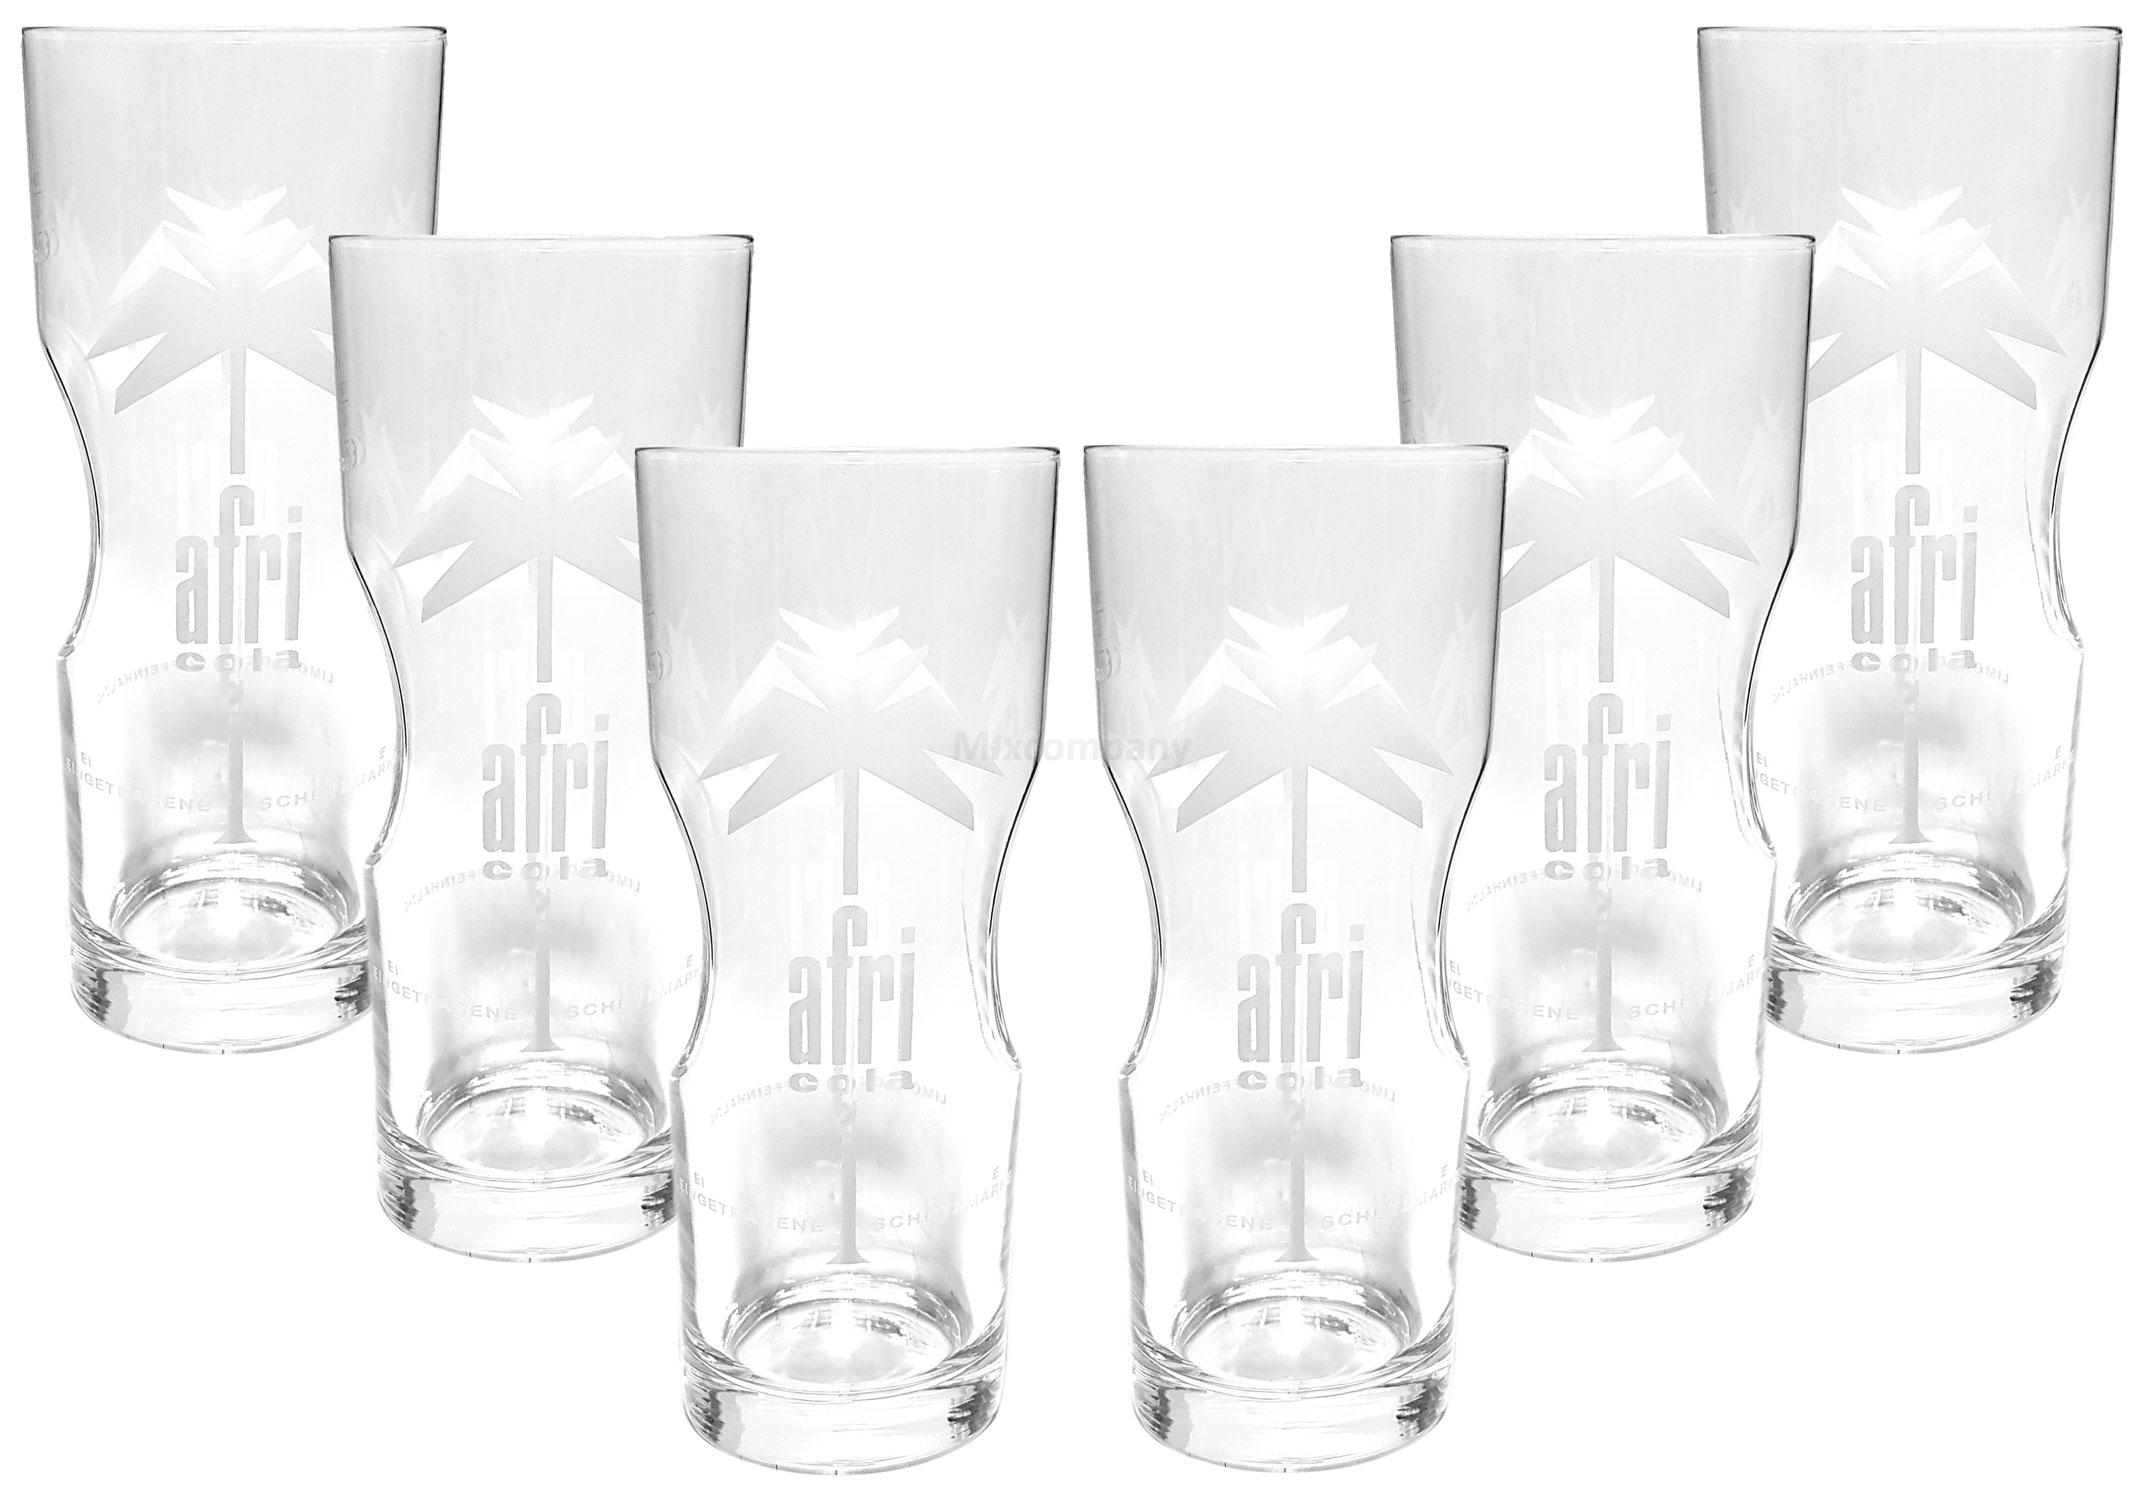 Afri Cola Contour Glas Gläser Set - 6x Gläser 400ml